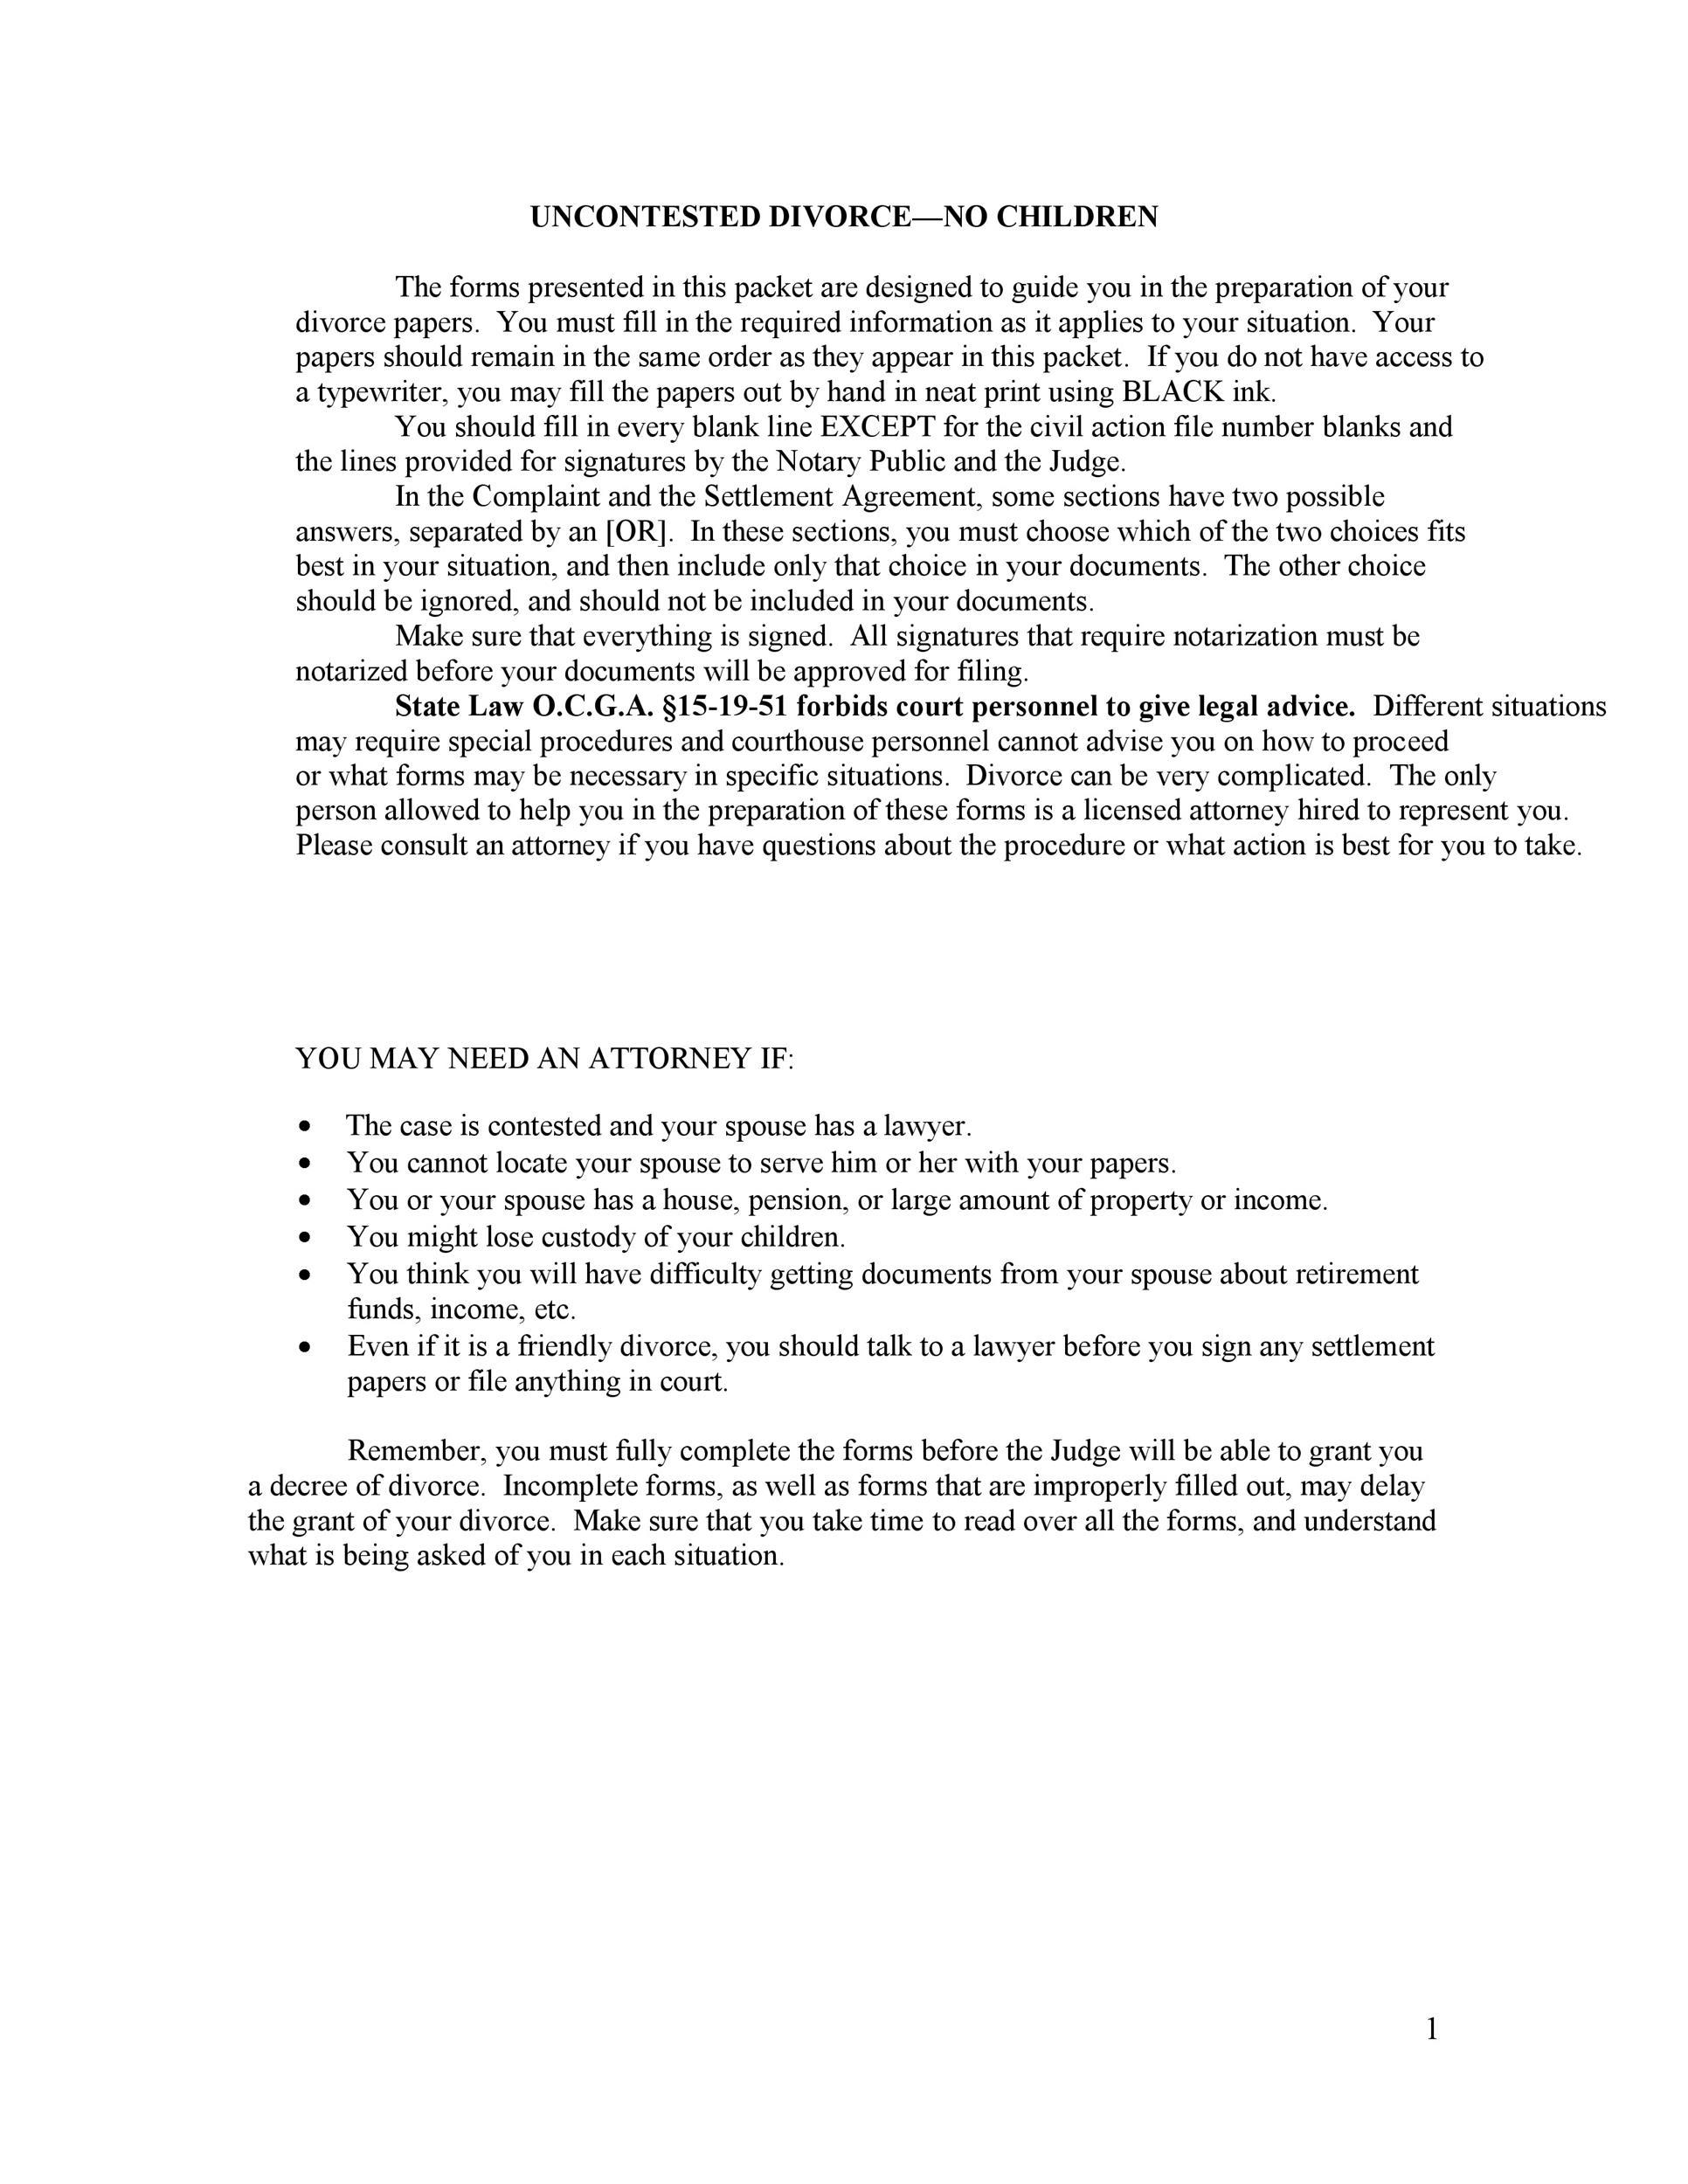 40 free divorce papers printable template lab. Black Bedroom Furniture Sets. Home Design Ideas